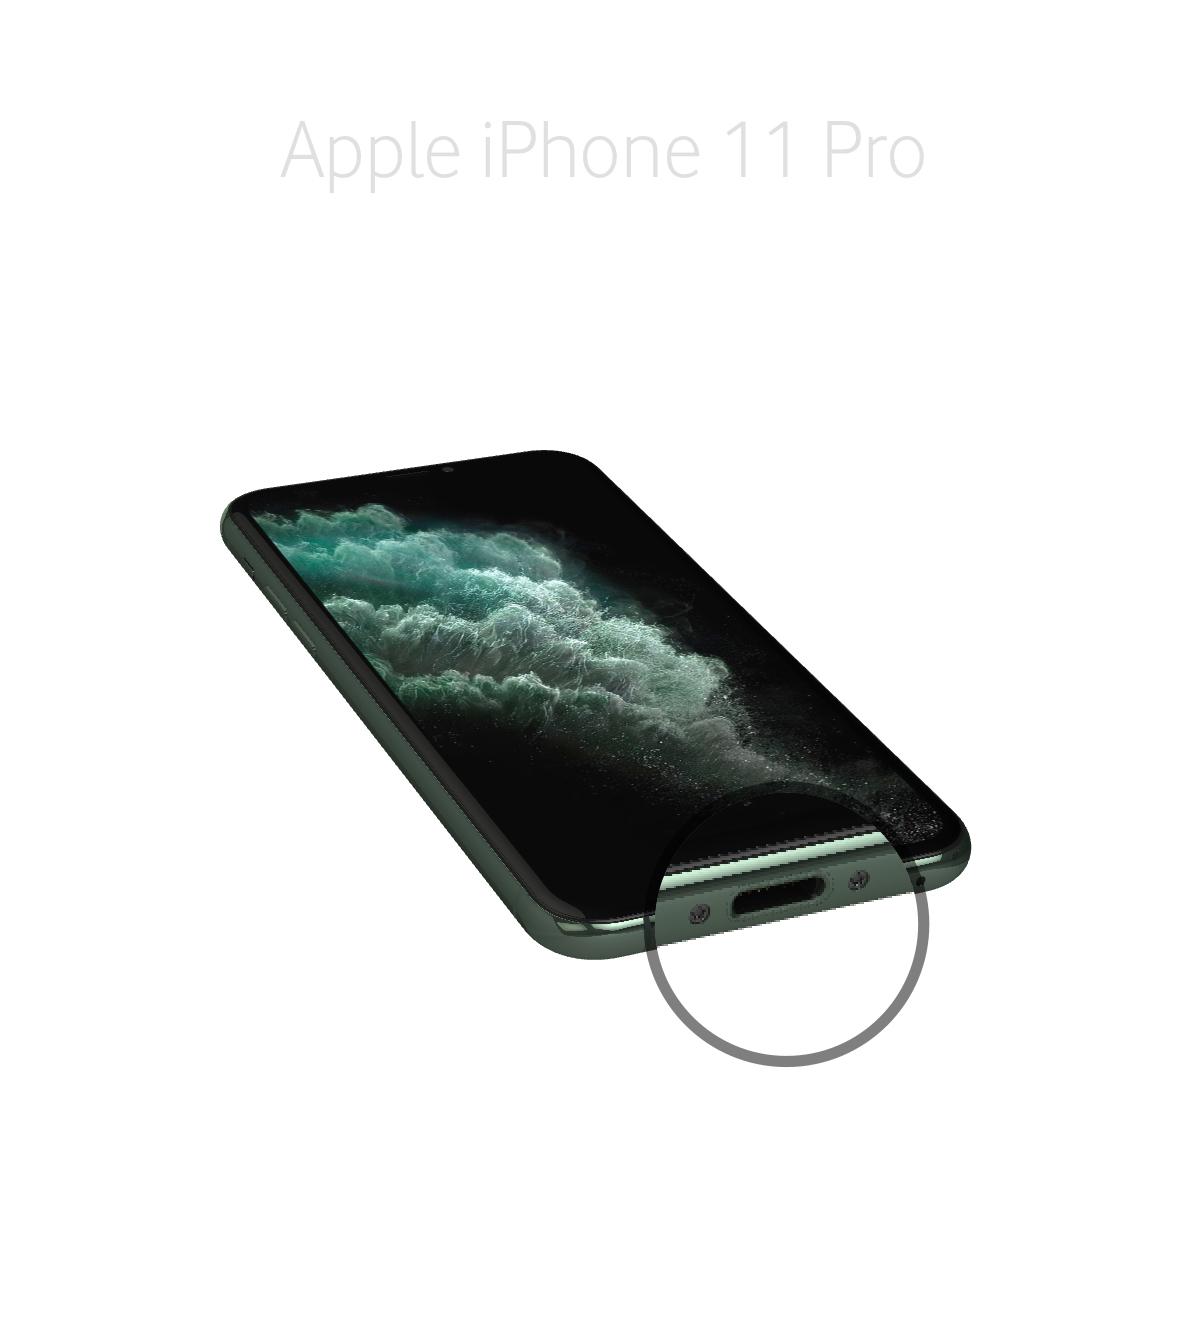 Laga lightningkontakt iPhone 11 Pro